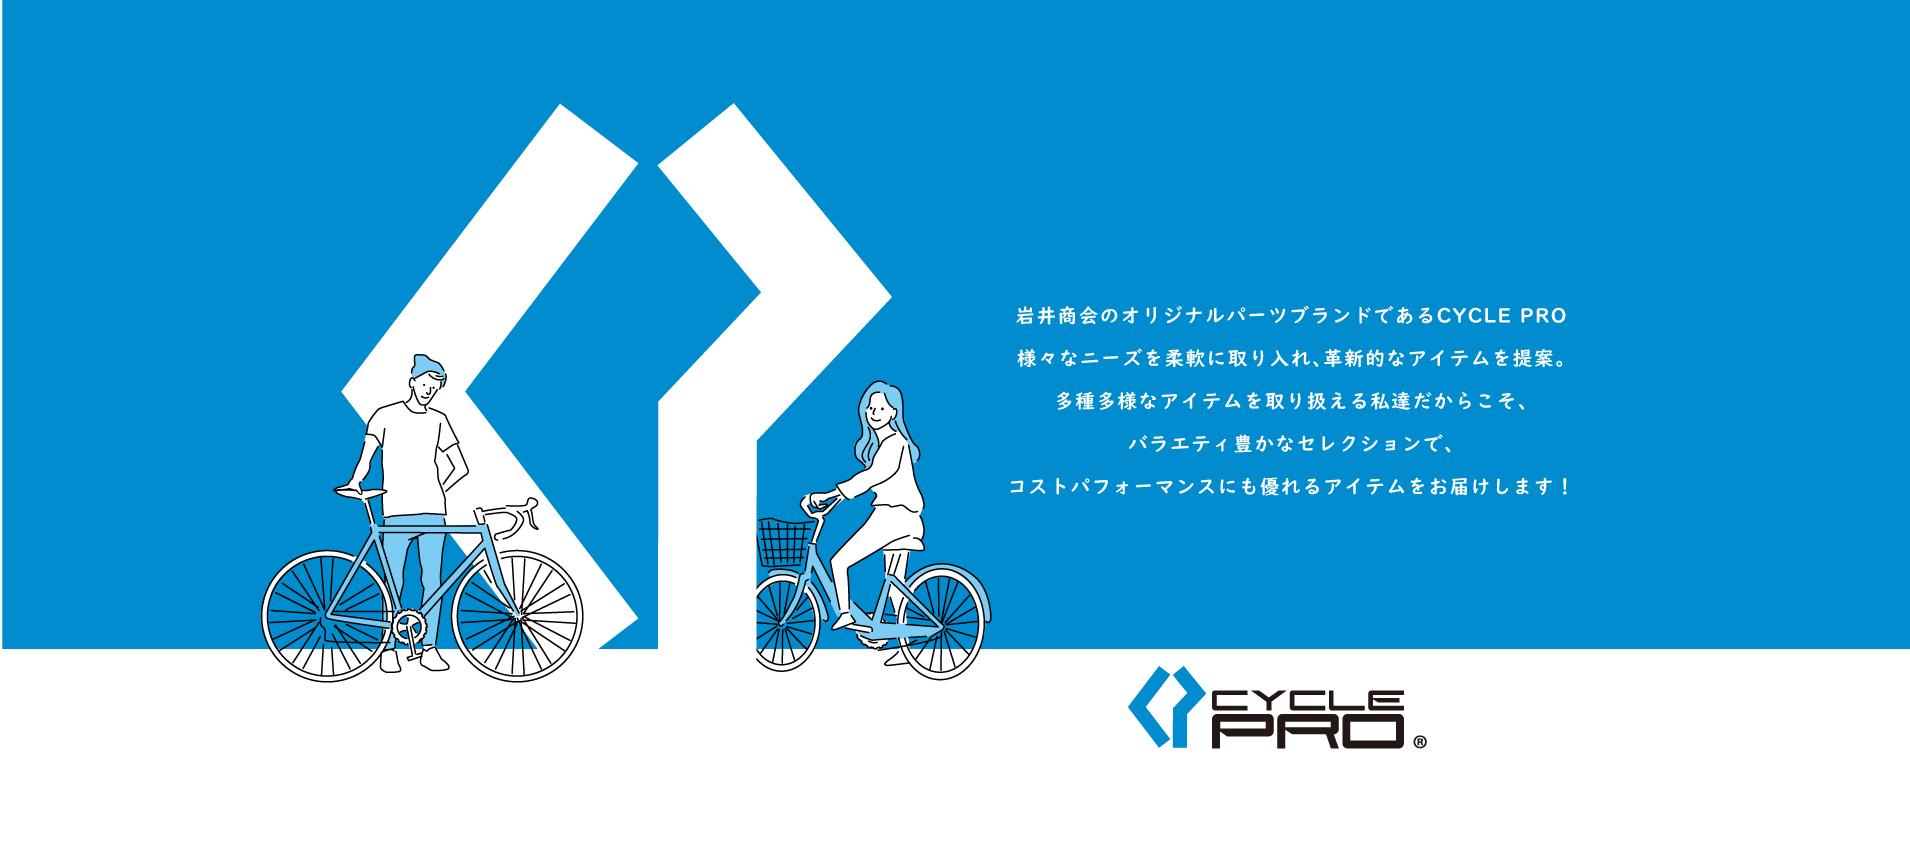 https://www.iwaishokai.com/sites/default/files/revslider/image/CYCLE-PRO-IMG_0.jpg